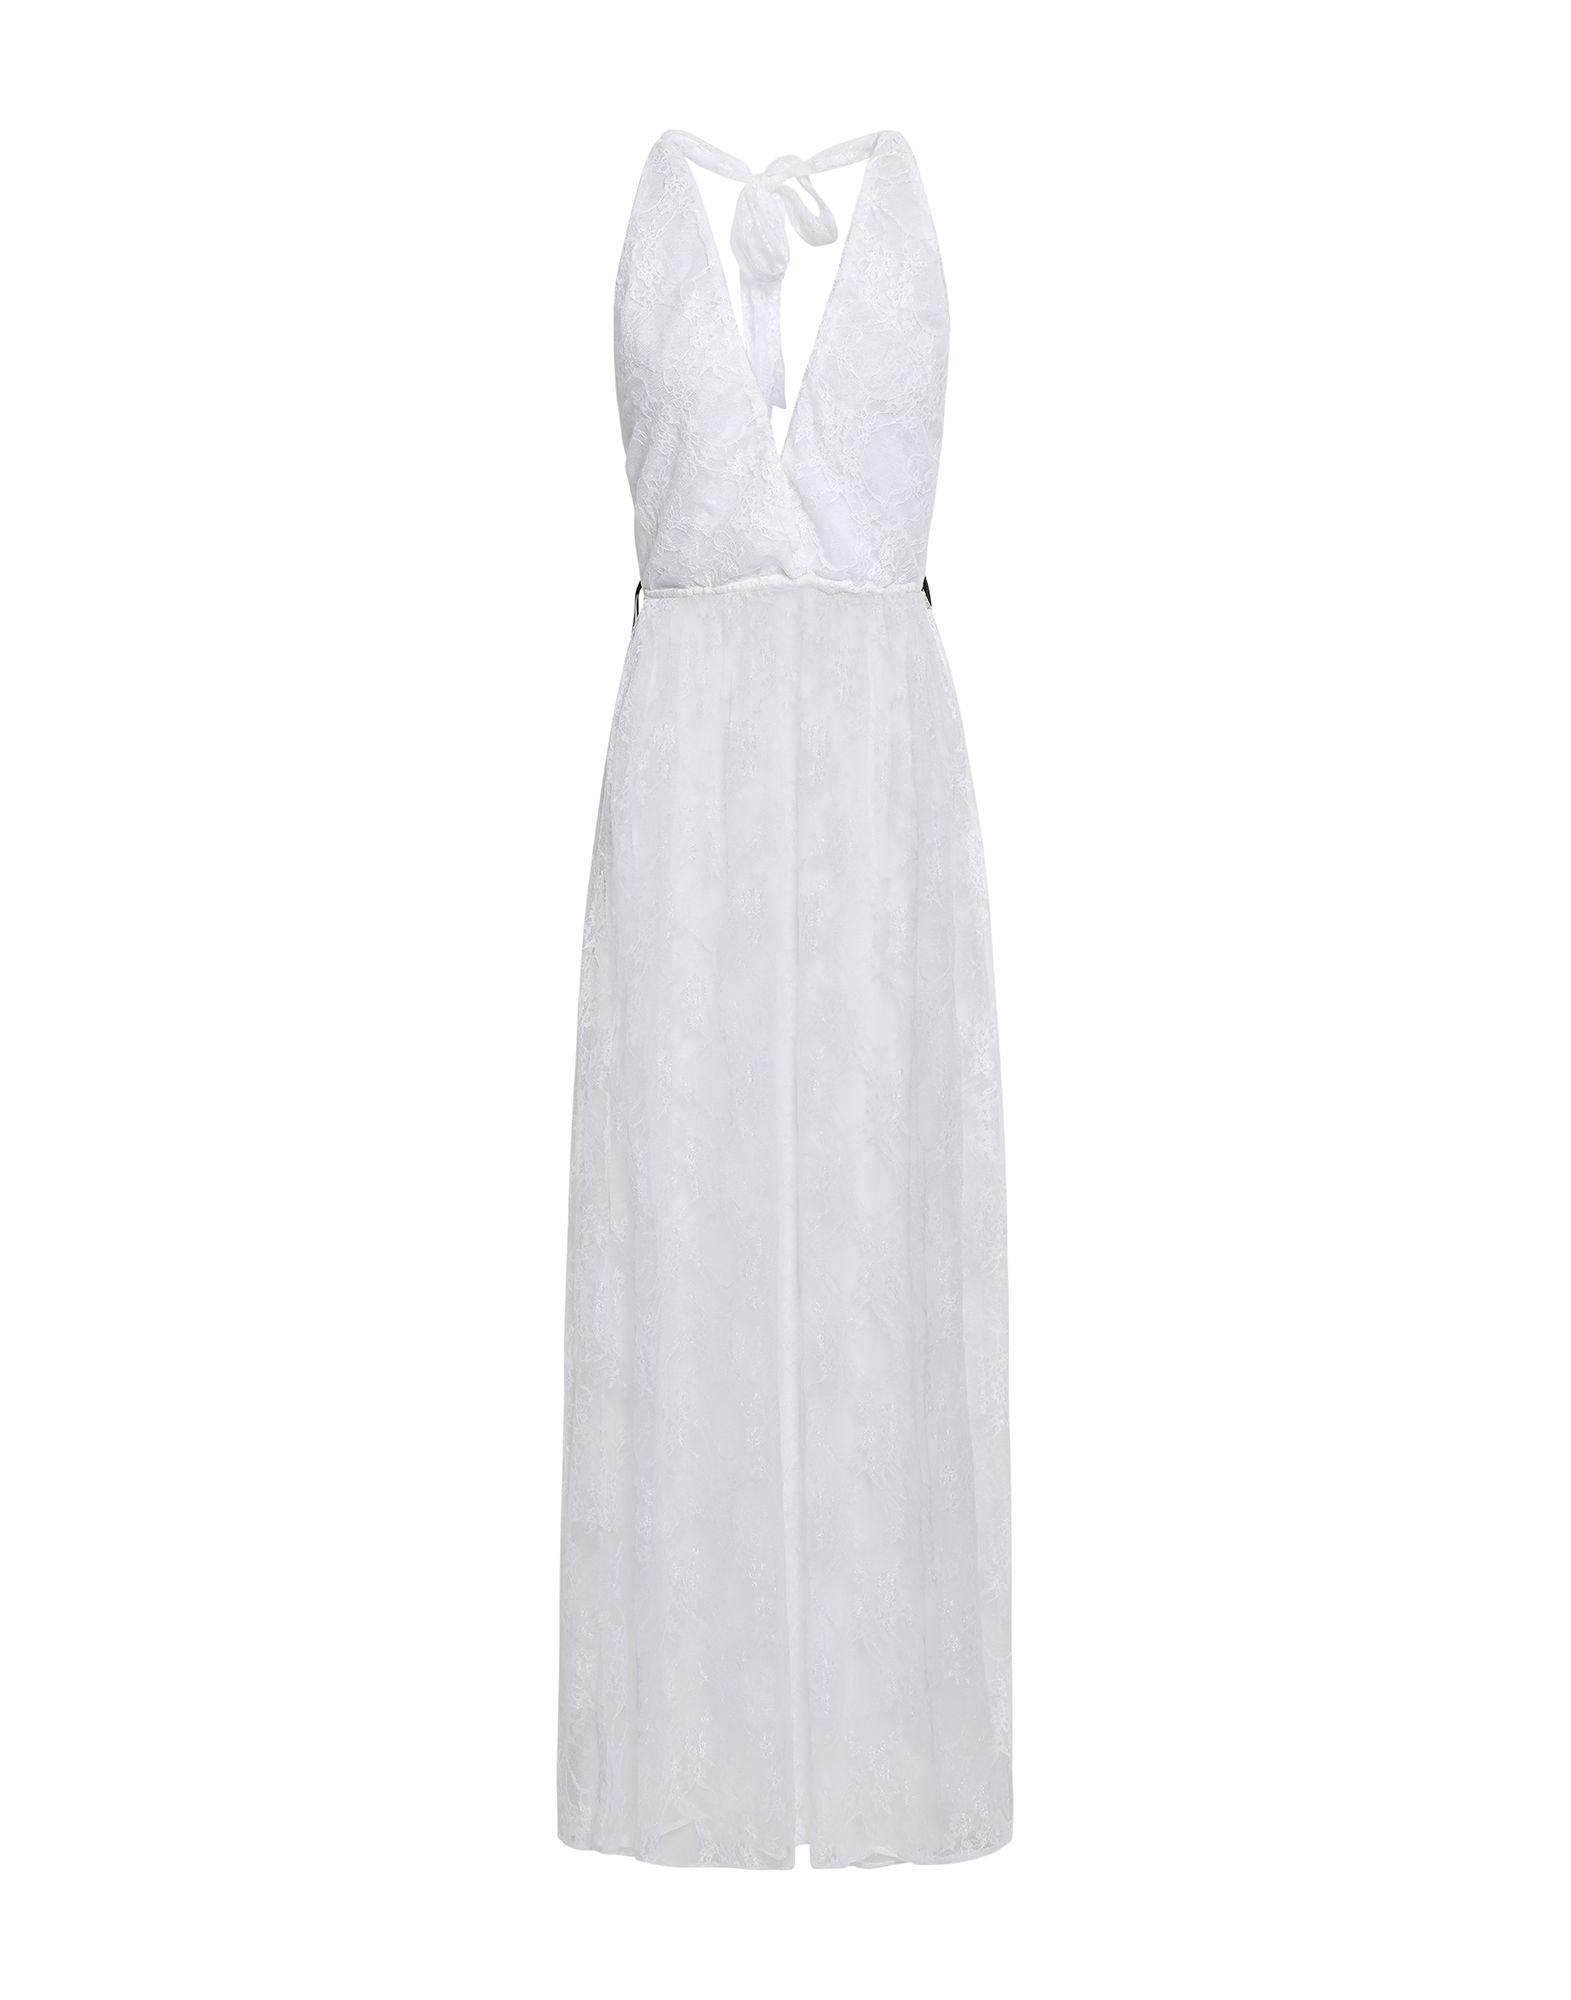 ADRIANA DEGREAS Пляжное платье adriana degreas комбинезоны без бретелей